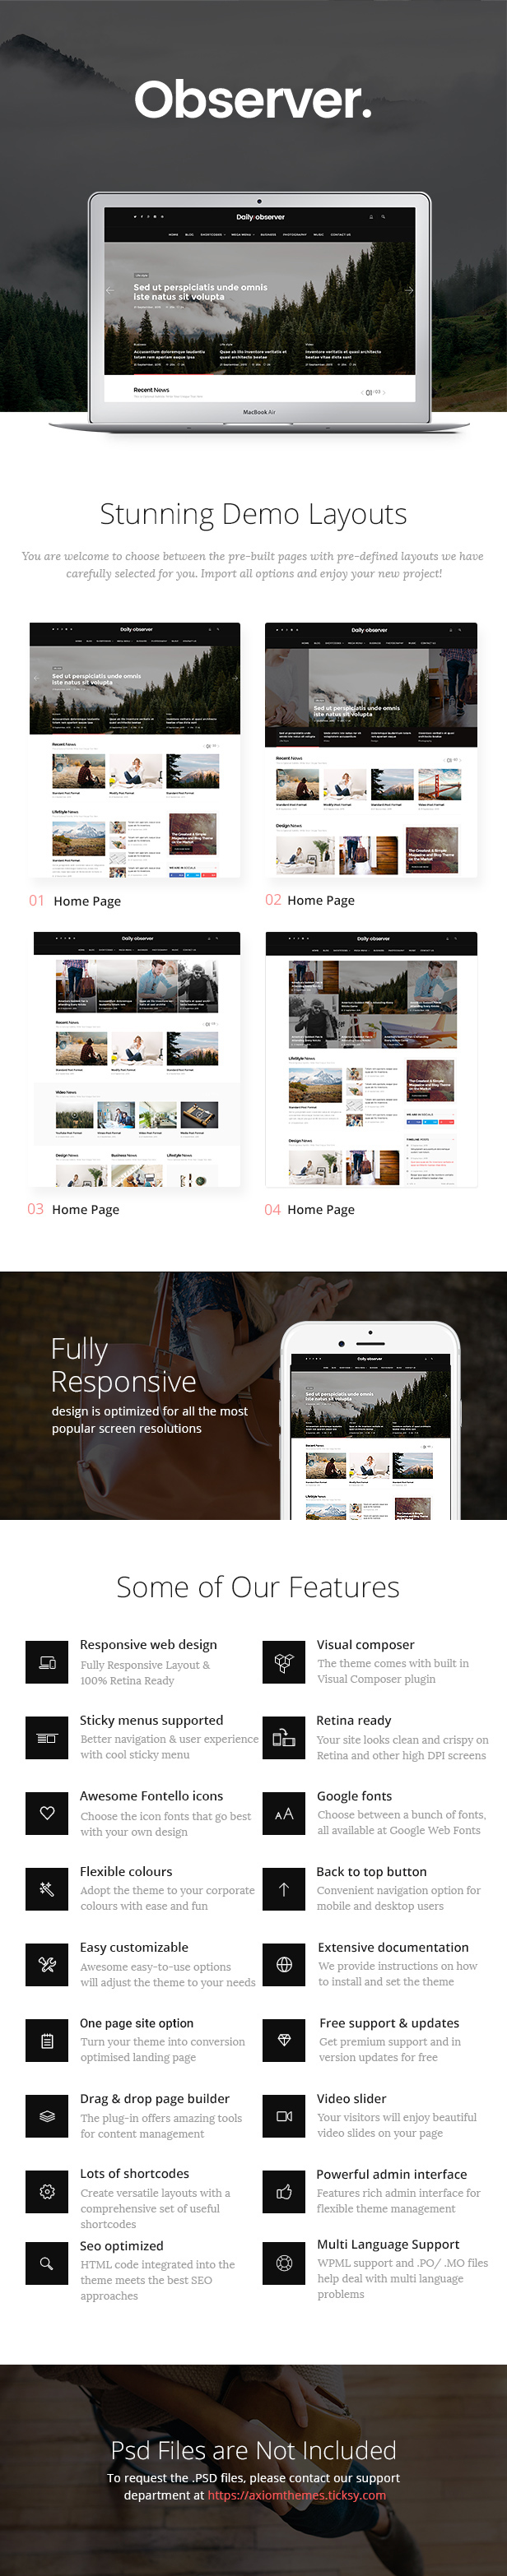 Modern Magazine, Review & News Portal WordPress Theme features